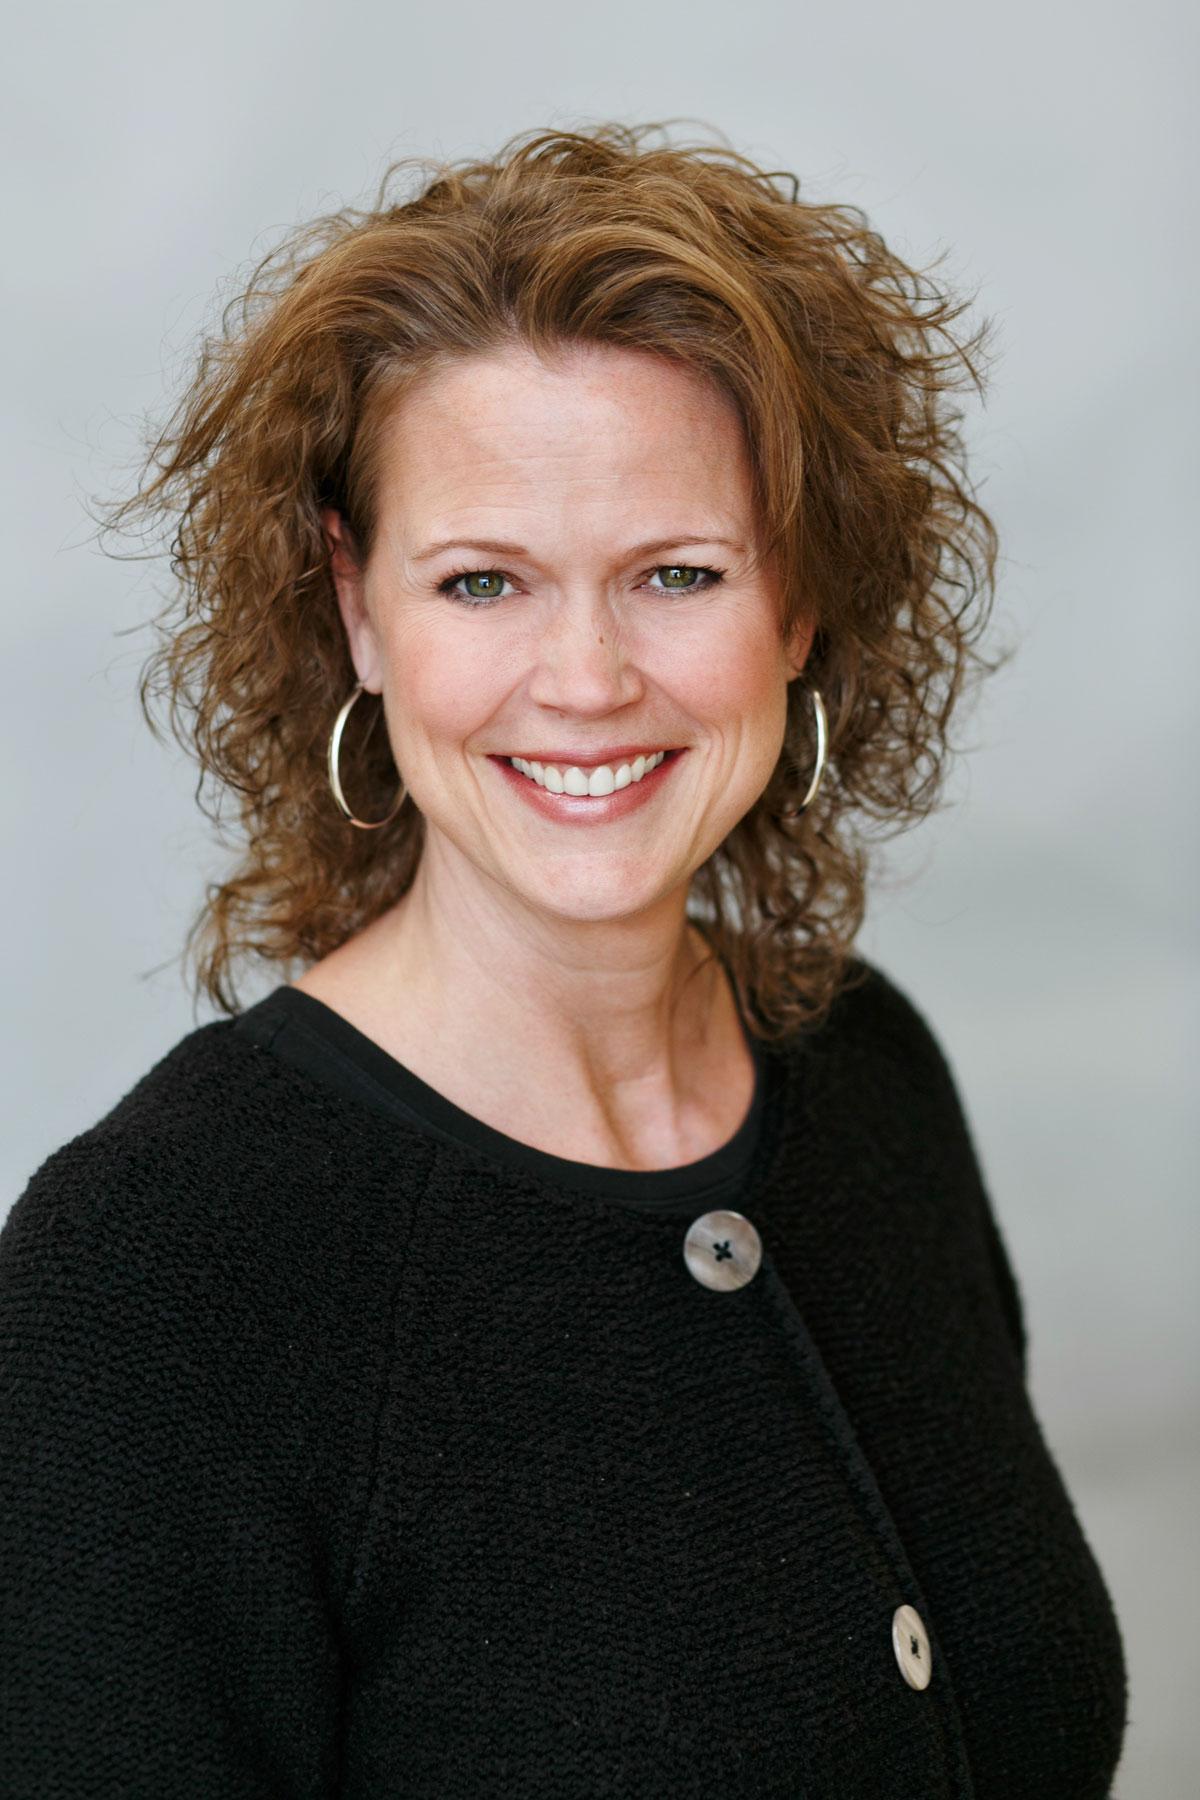 Janean Shumaker, Administrative Assistant